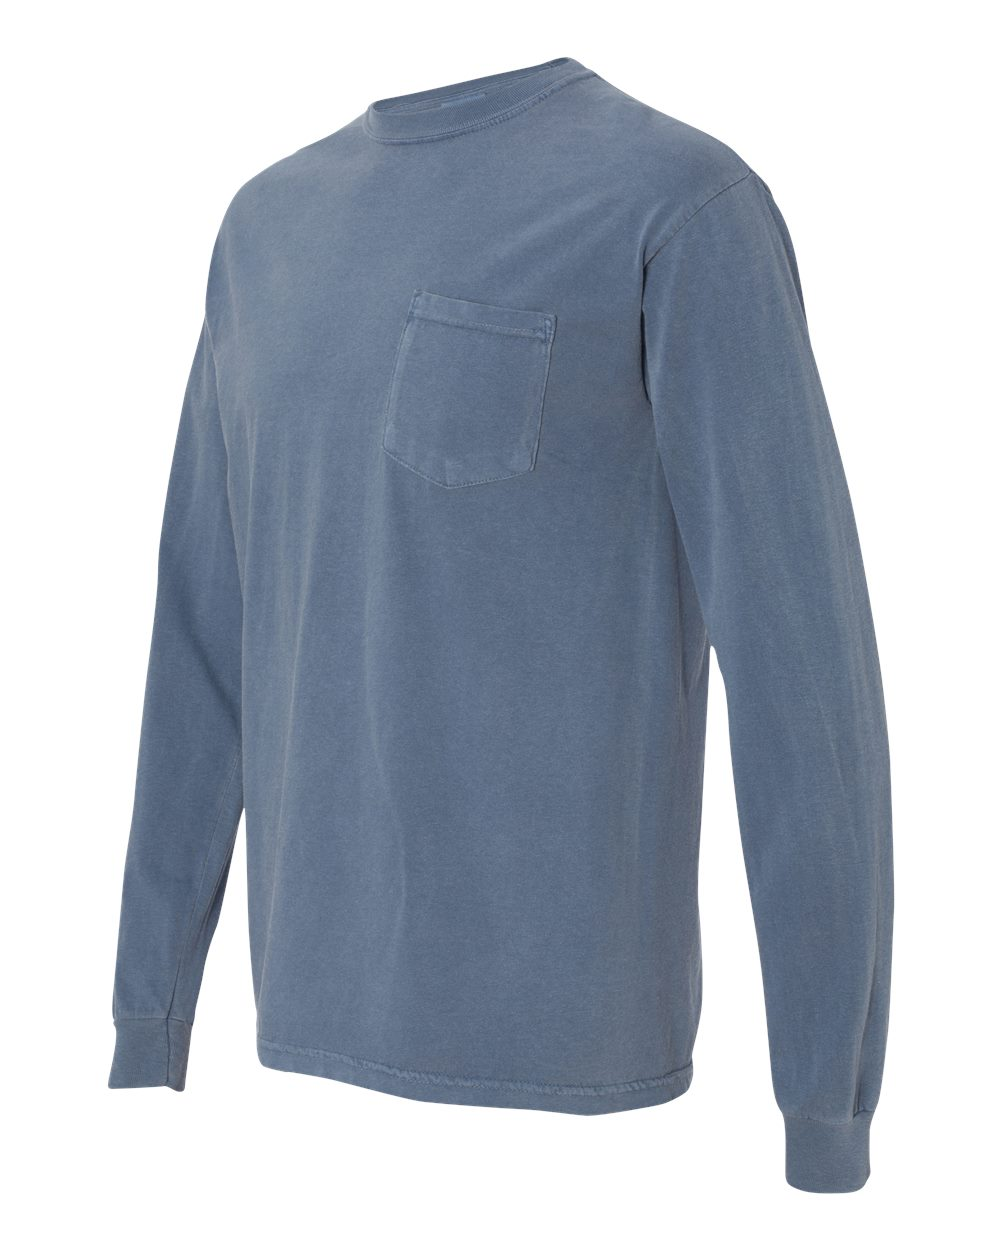 Comfort-Colors-Men-039-s-6-1-oz-Long-Sleeve-Pocket-T-Shirt-C4410-S-3XL thumbnail 6